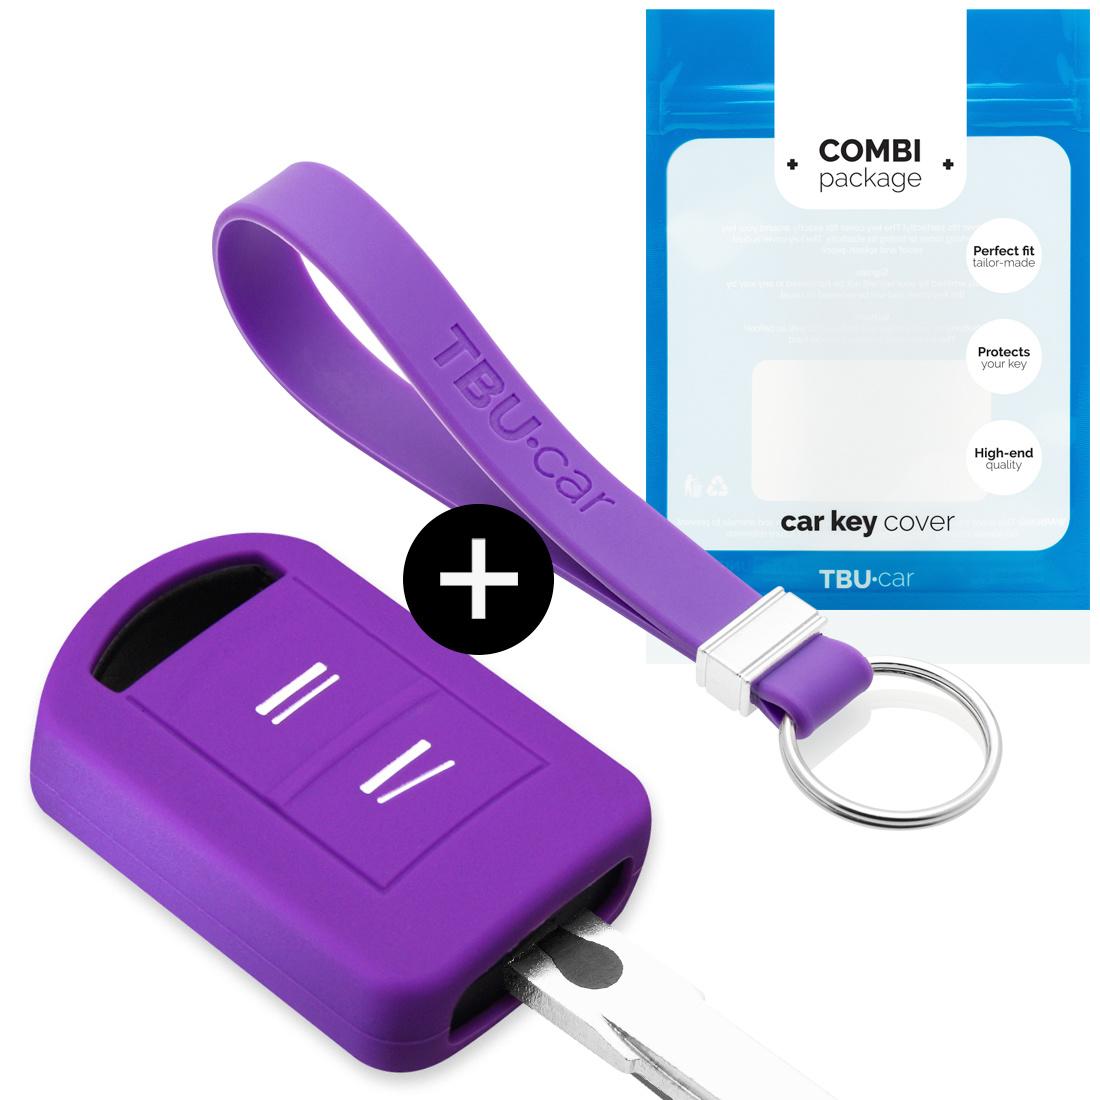 TBU car TBU car Autoschlüssel Hülle kompatibel mit Vauxhall 2 Tasten - Schutzhülle aus Silikon - Auto Schlüsselhülle Cover in Violett